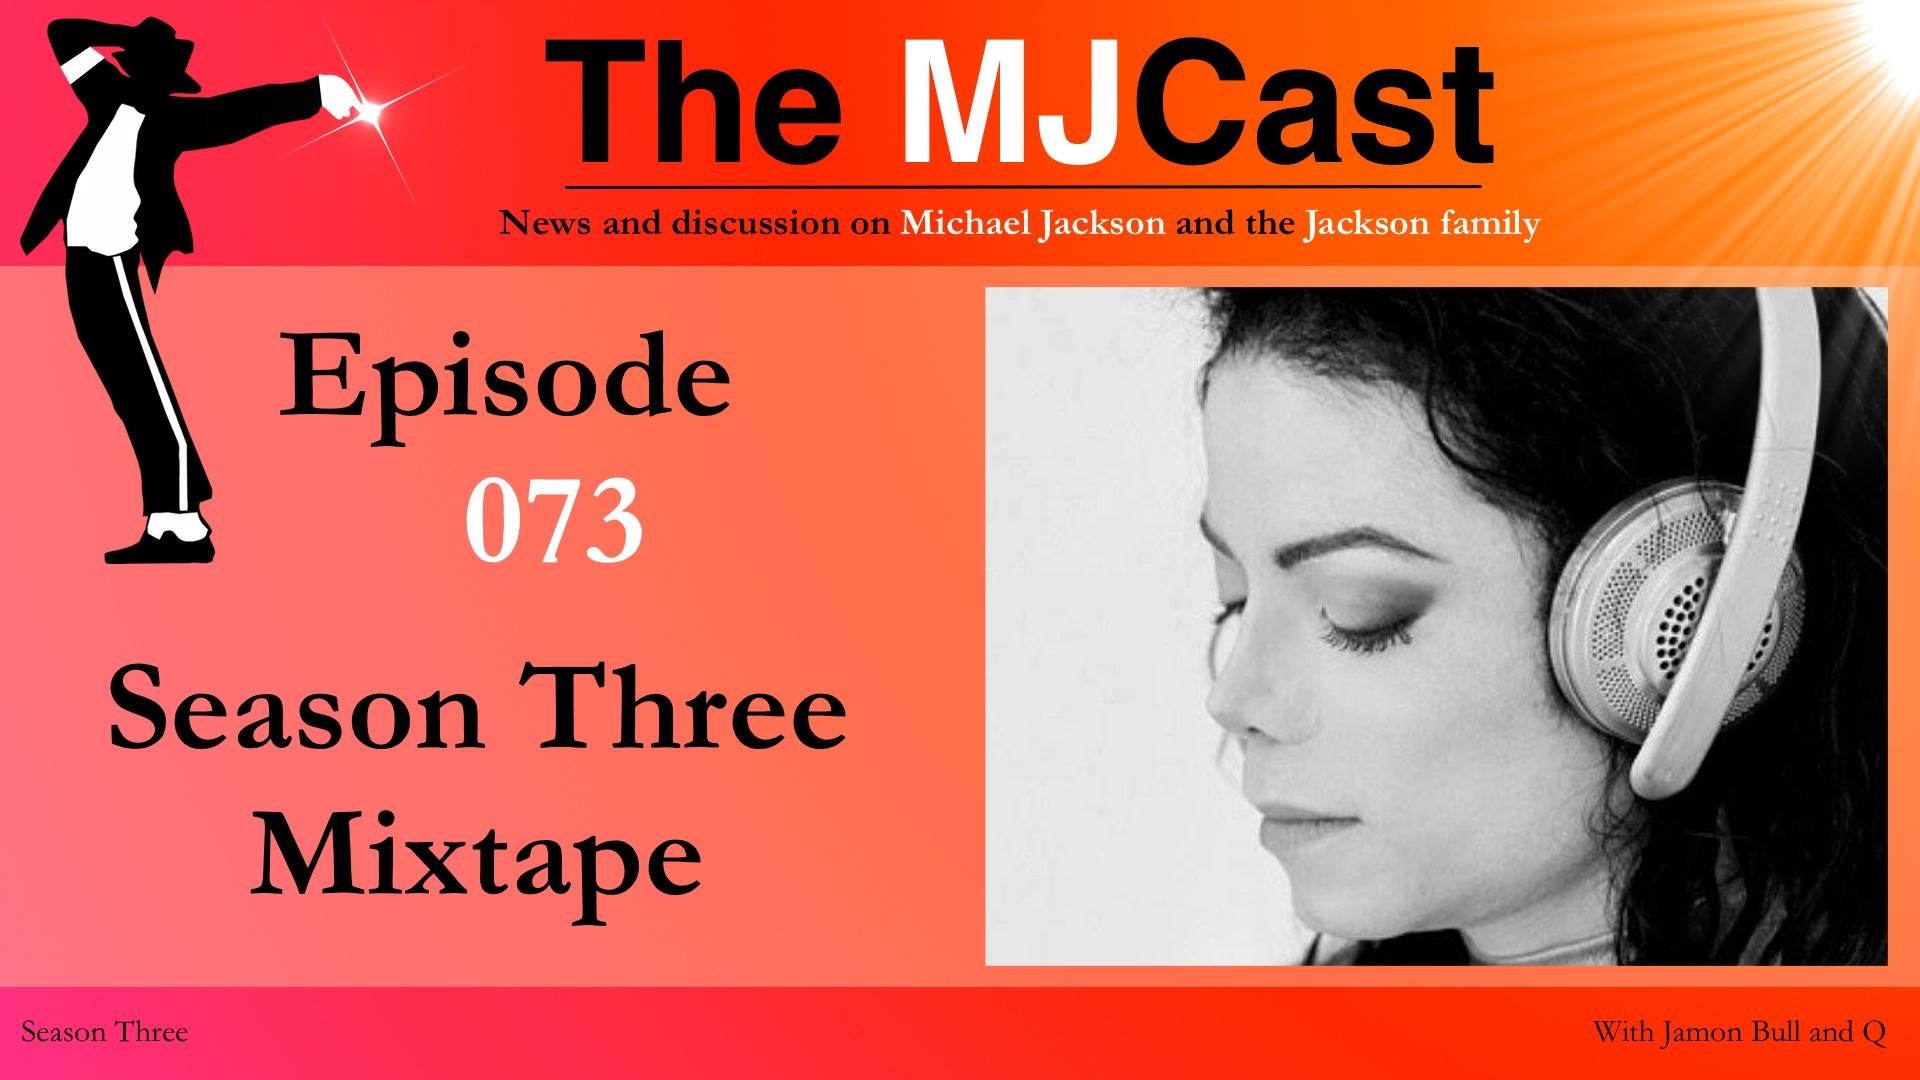 Episode 073 – Season Three Mixtape – The MJCast